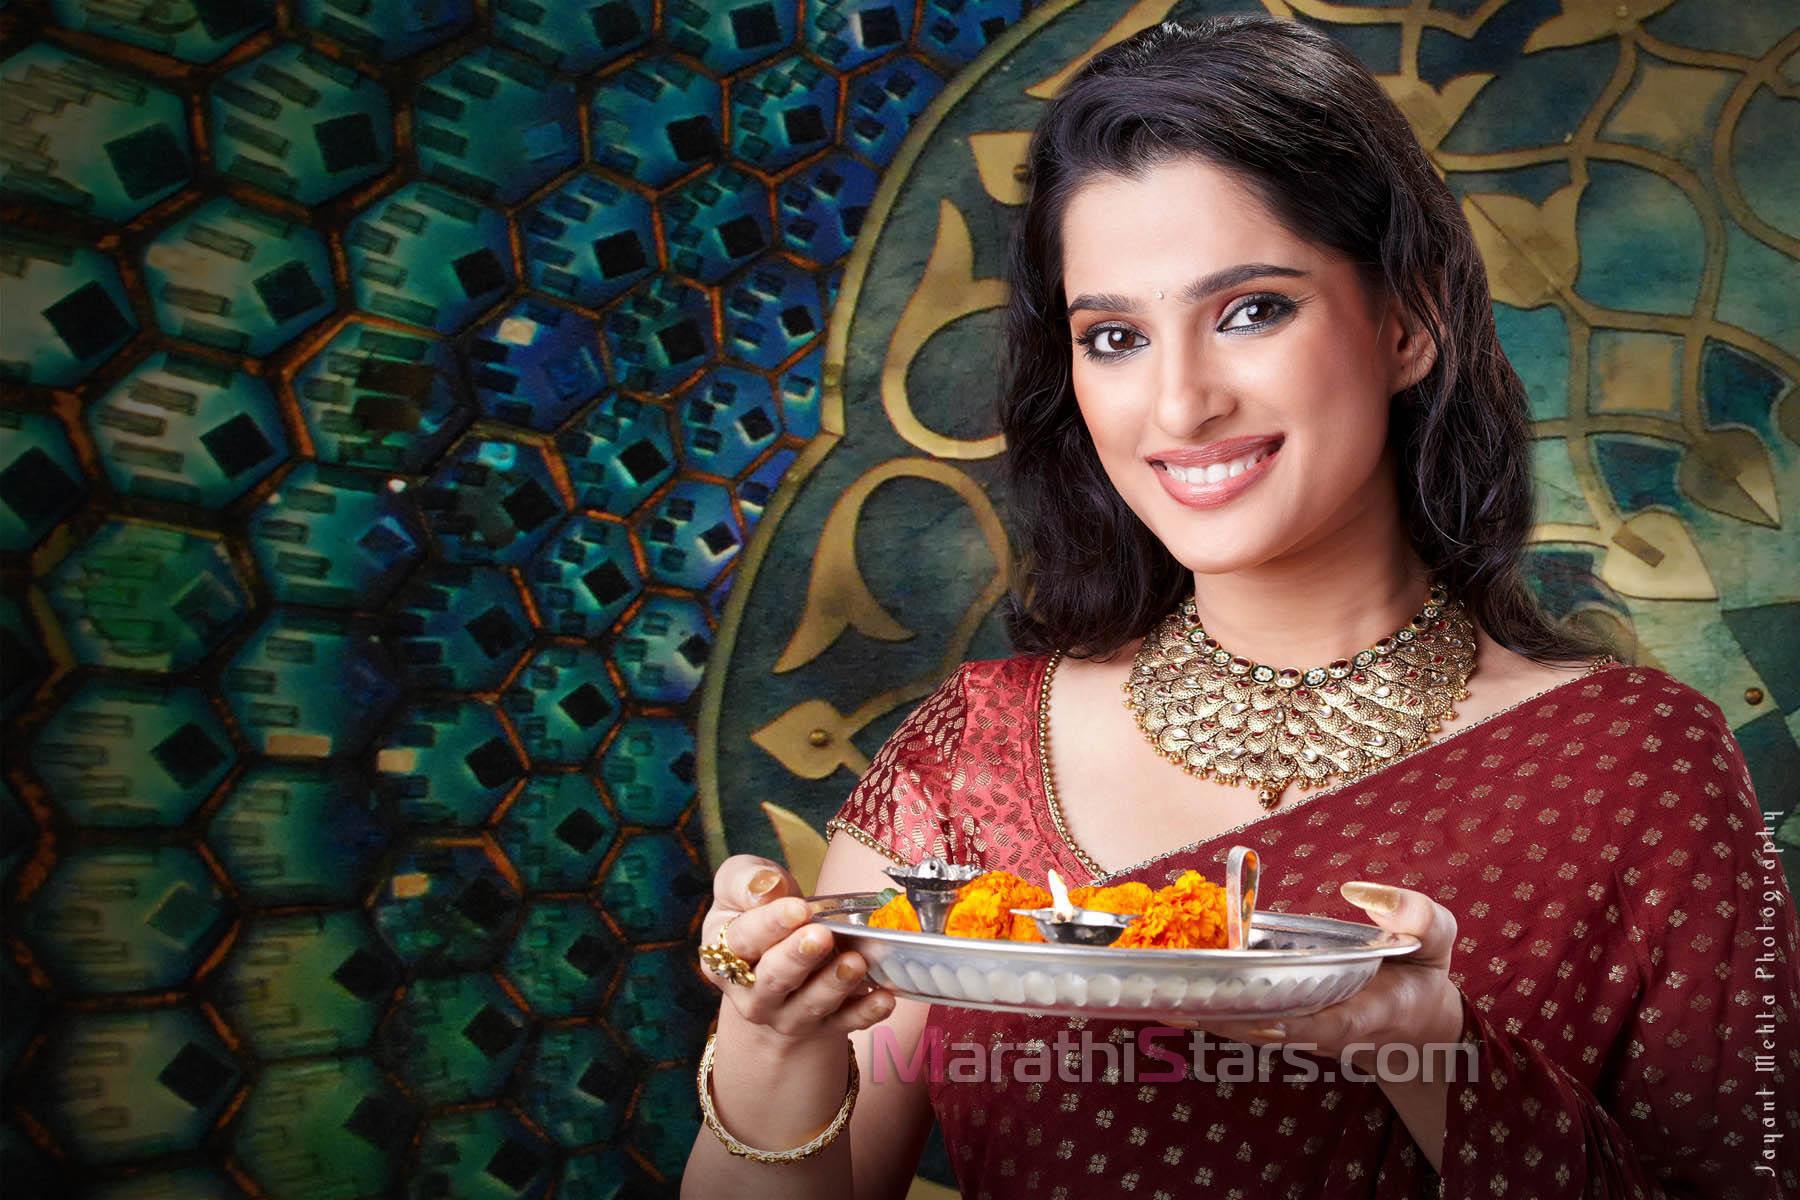 Priya Bapat Marathi Actress Photos,Biography,Wallpapers,Hot Images